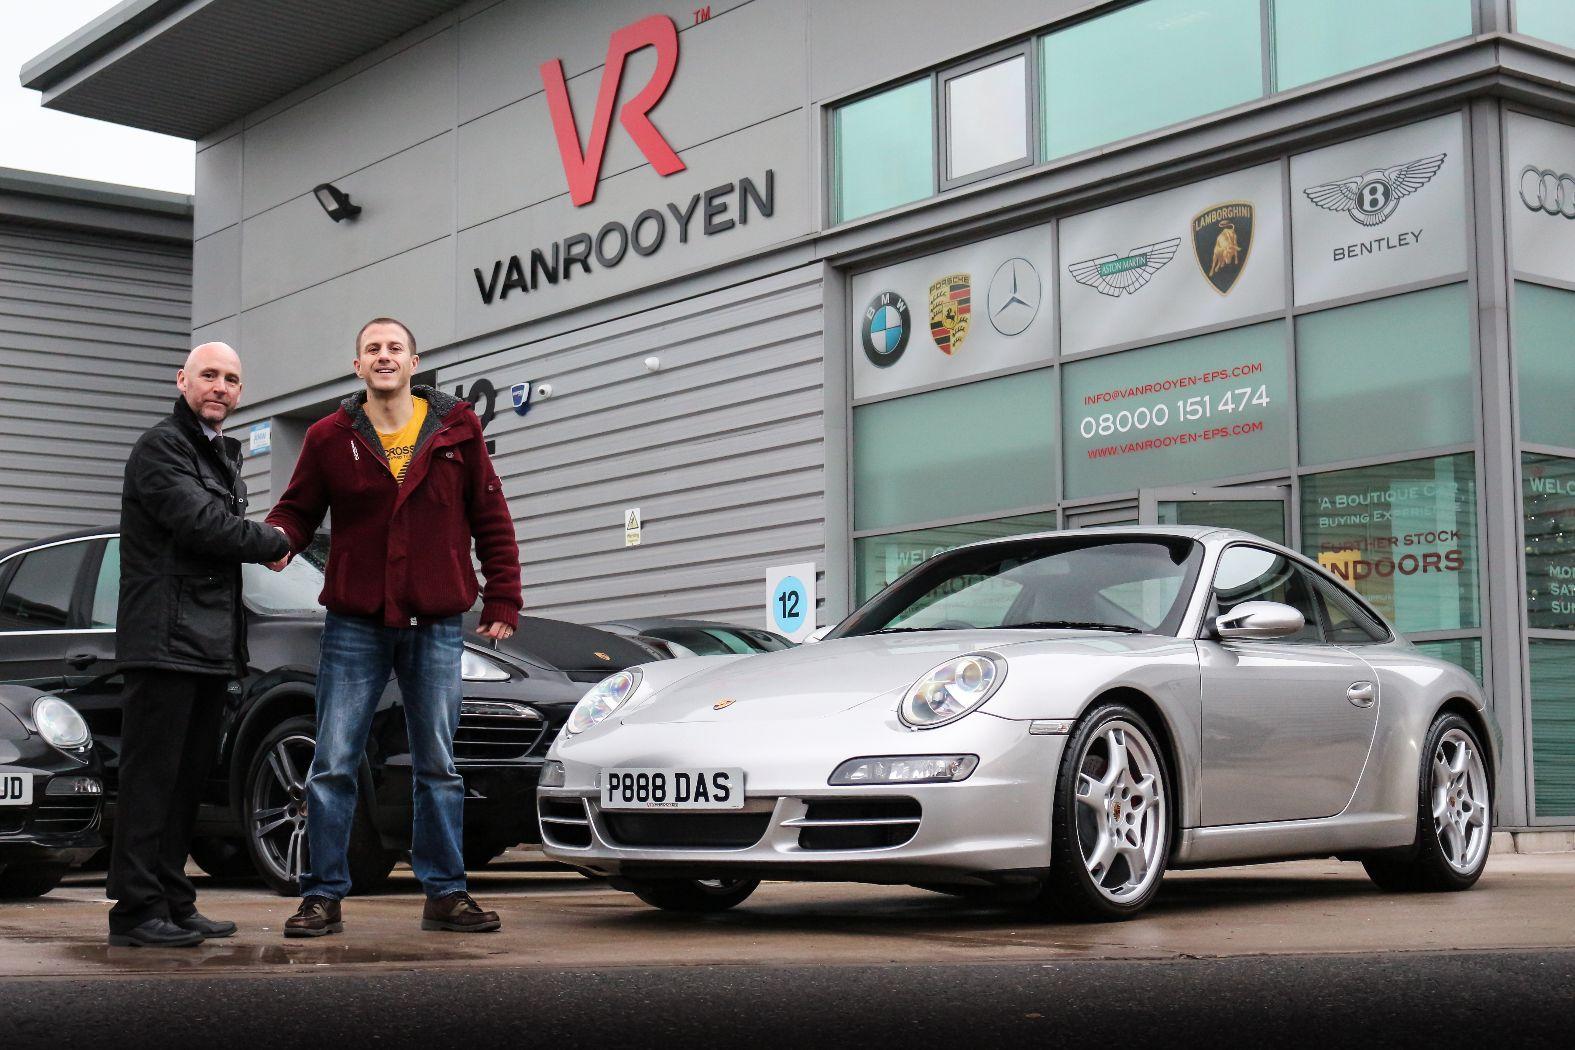 VR Warrington, Supercars, Supercars for Sale, Supercar Dealer, Warrington, Cheshire